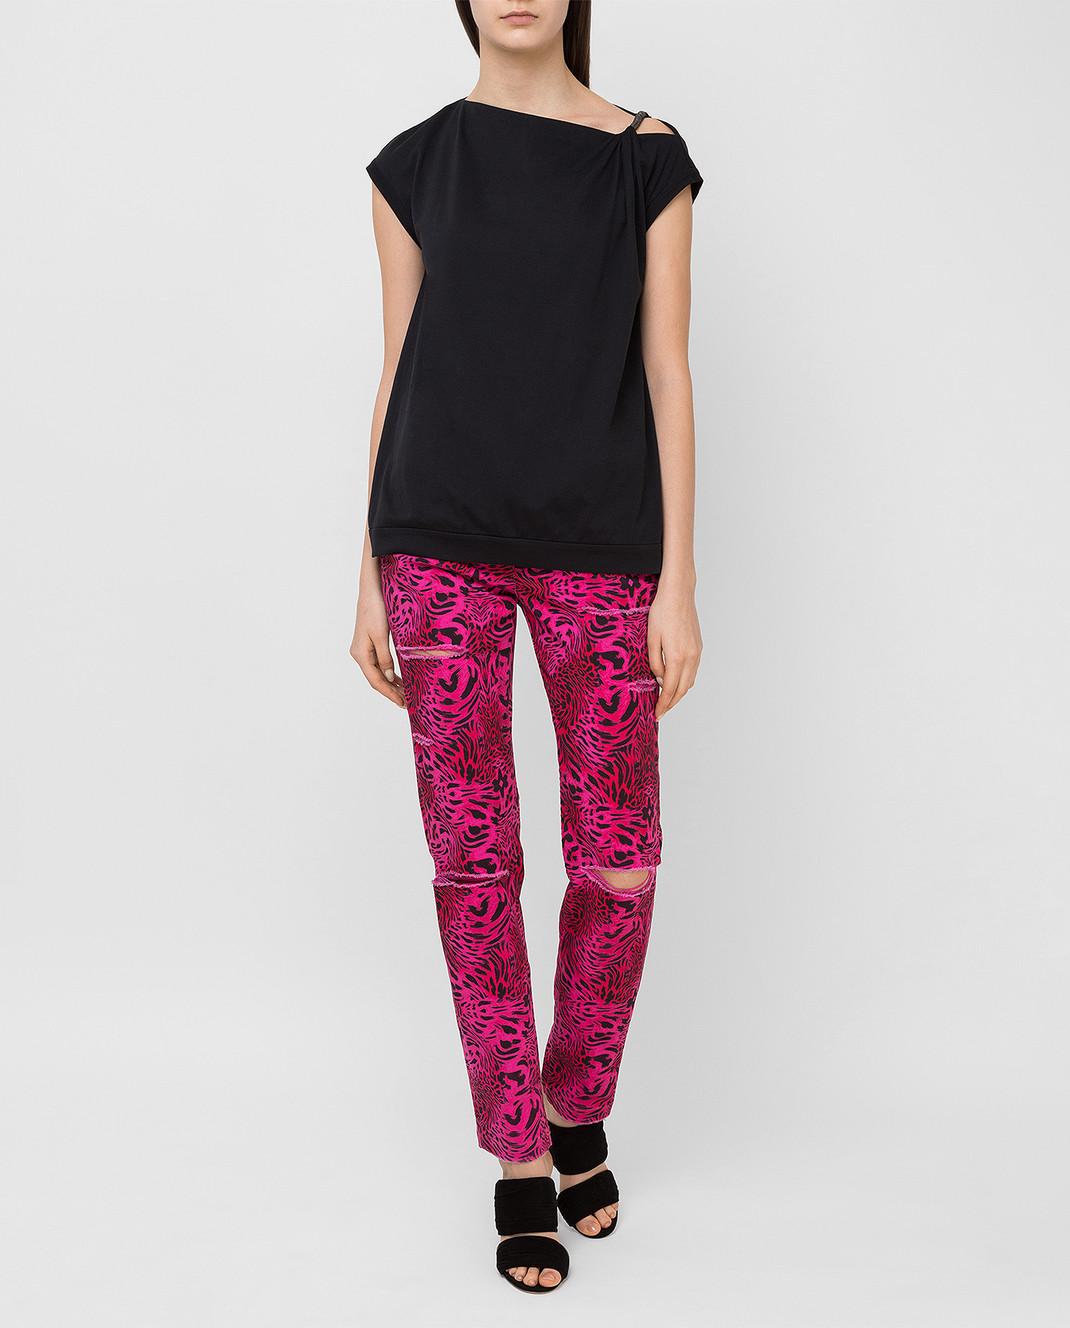 Philipp Plein Розовые джинсы CWDT0208 изображение 2